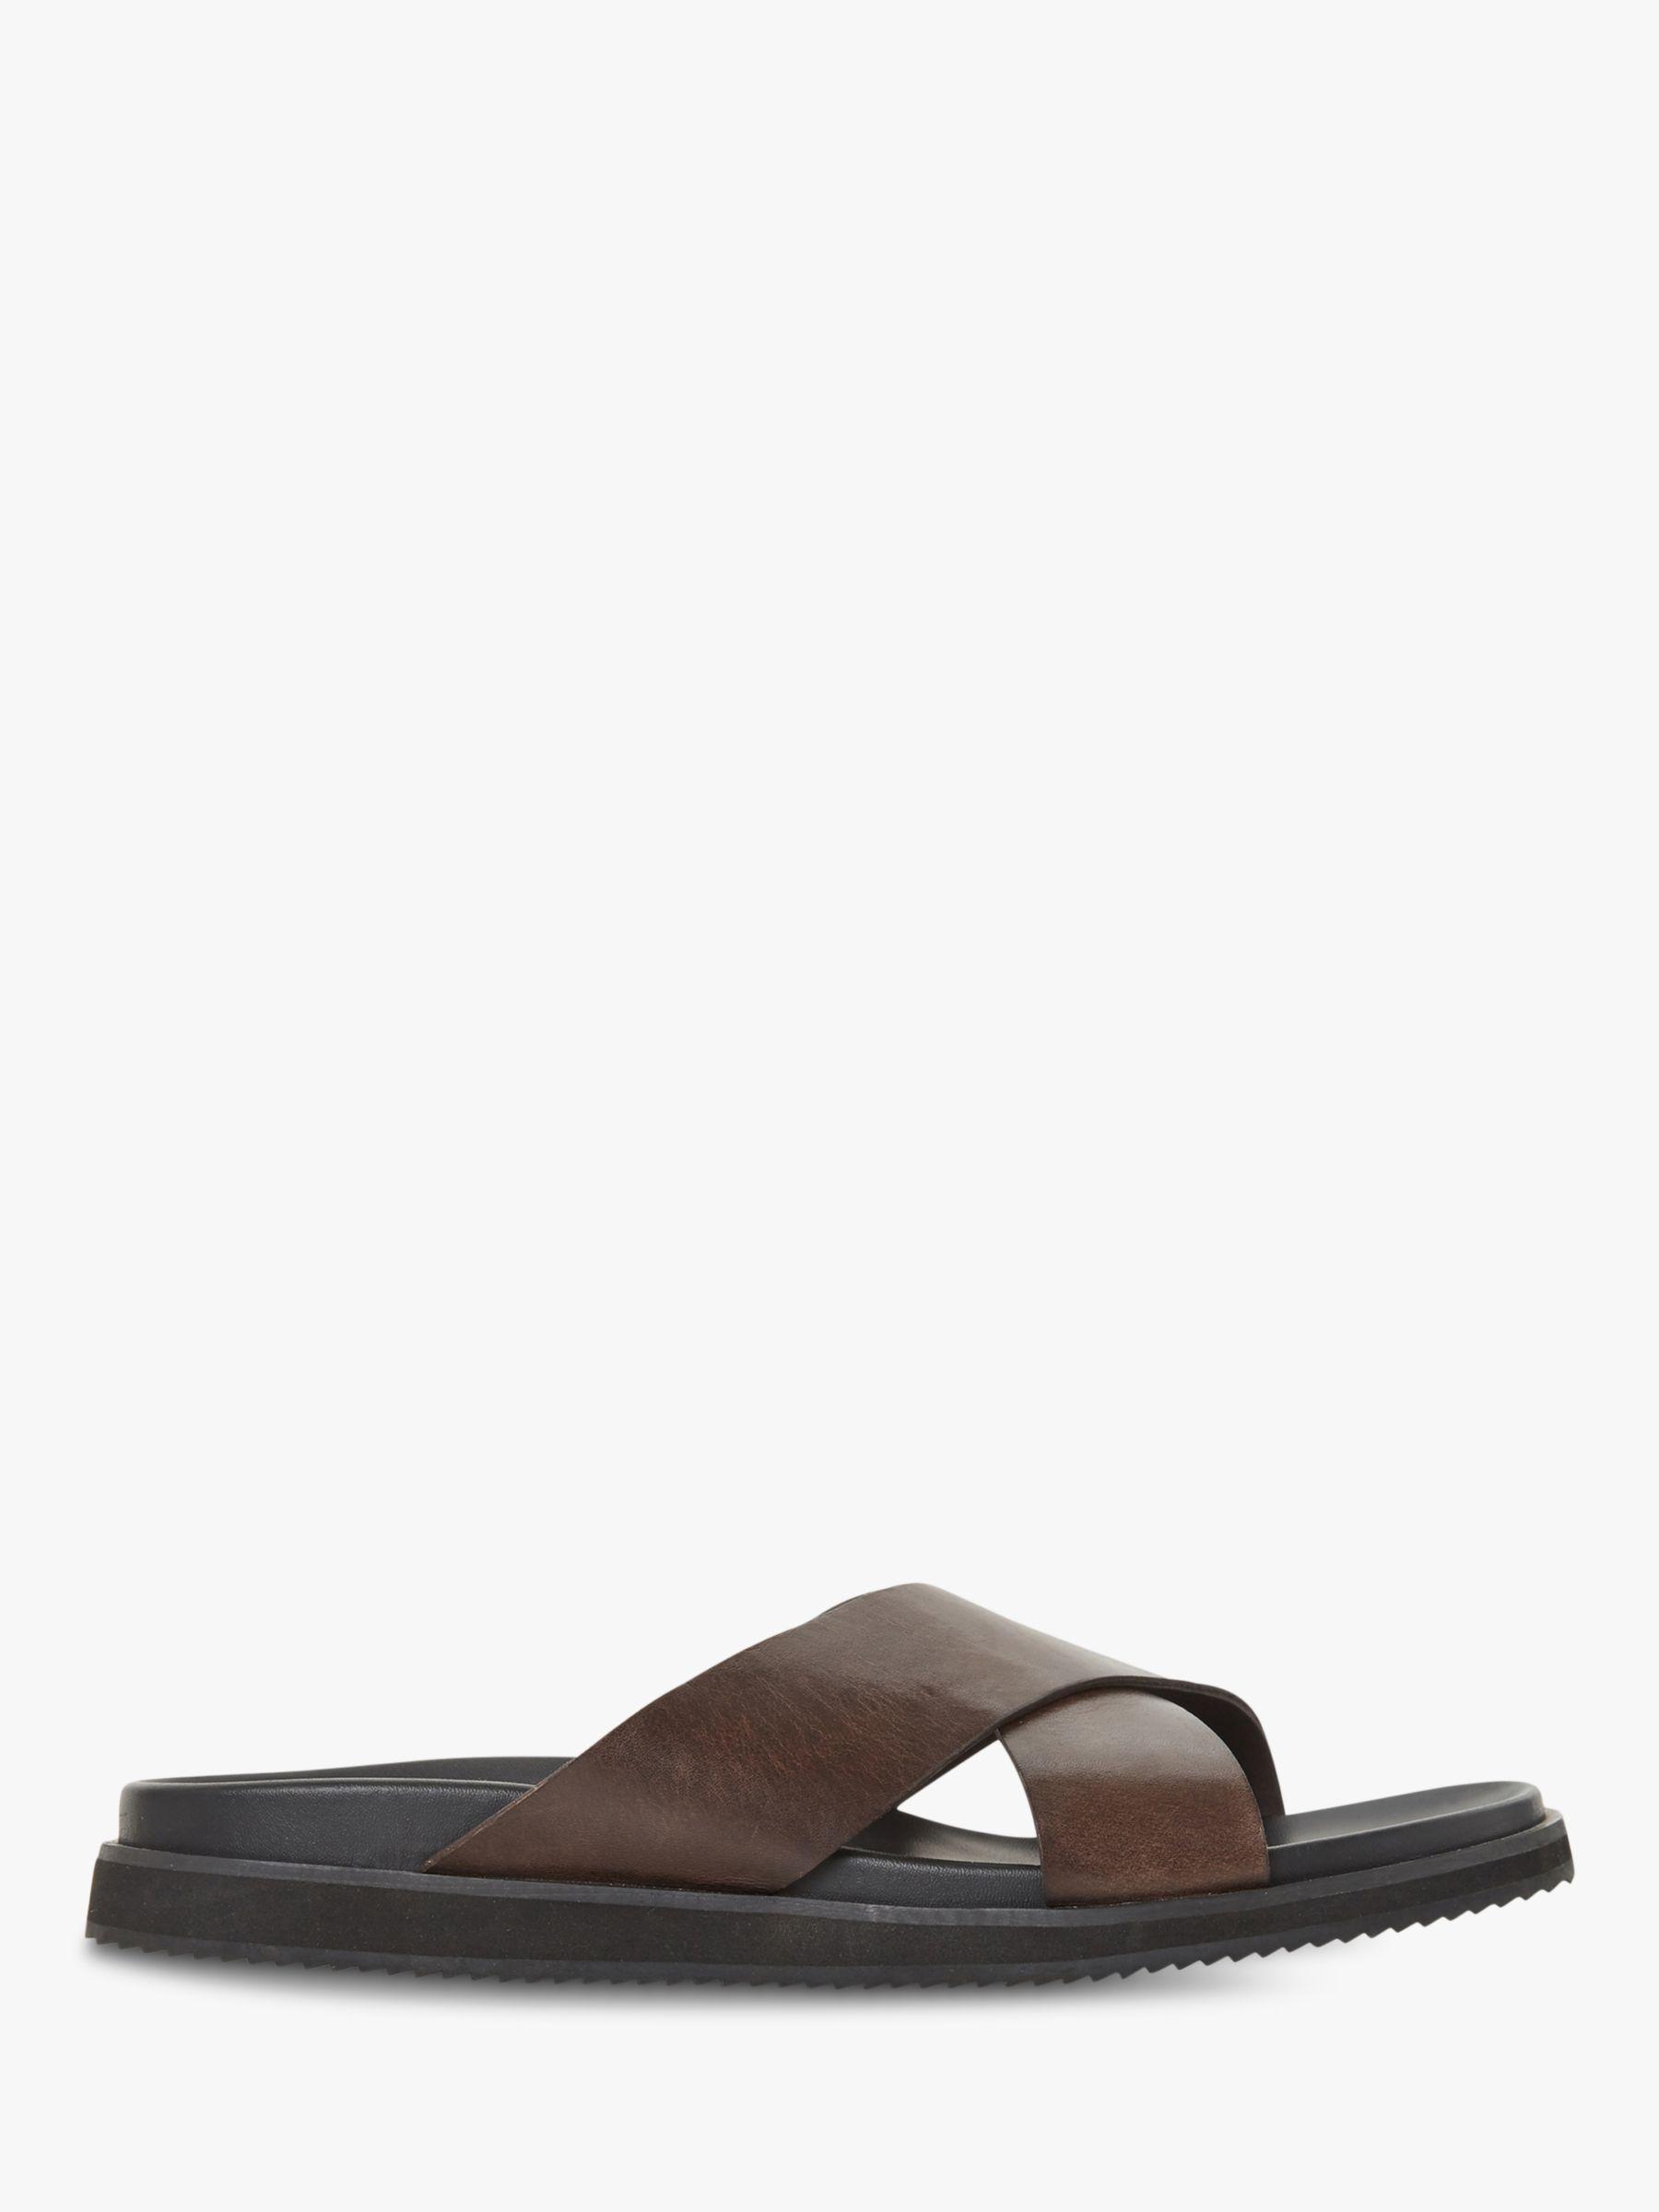 Bertie Bertie Idiom Leather Cross Strap Sandals, Brown